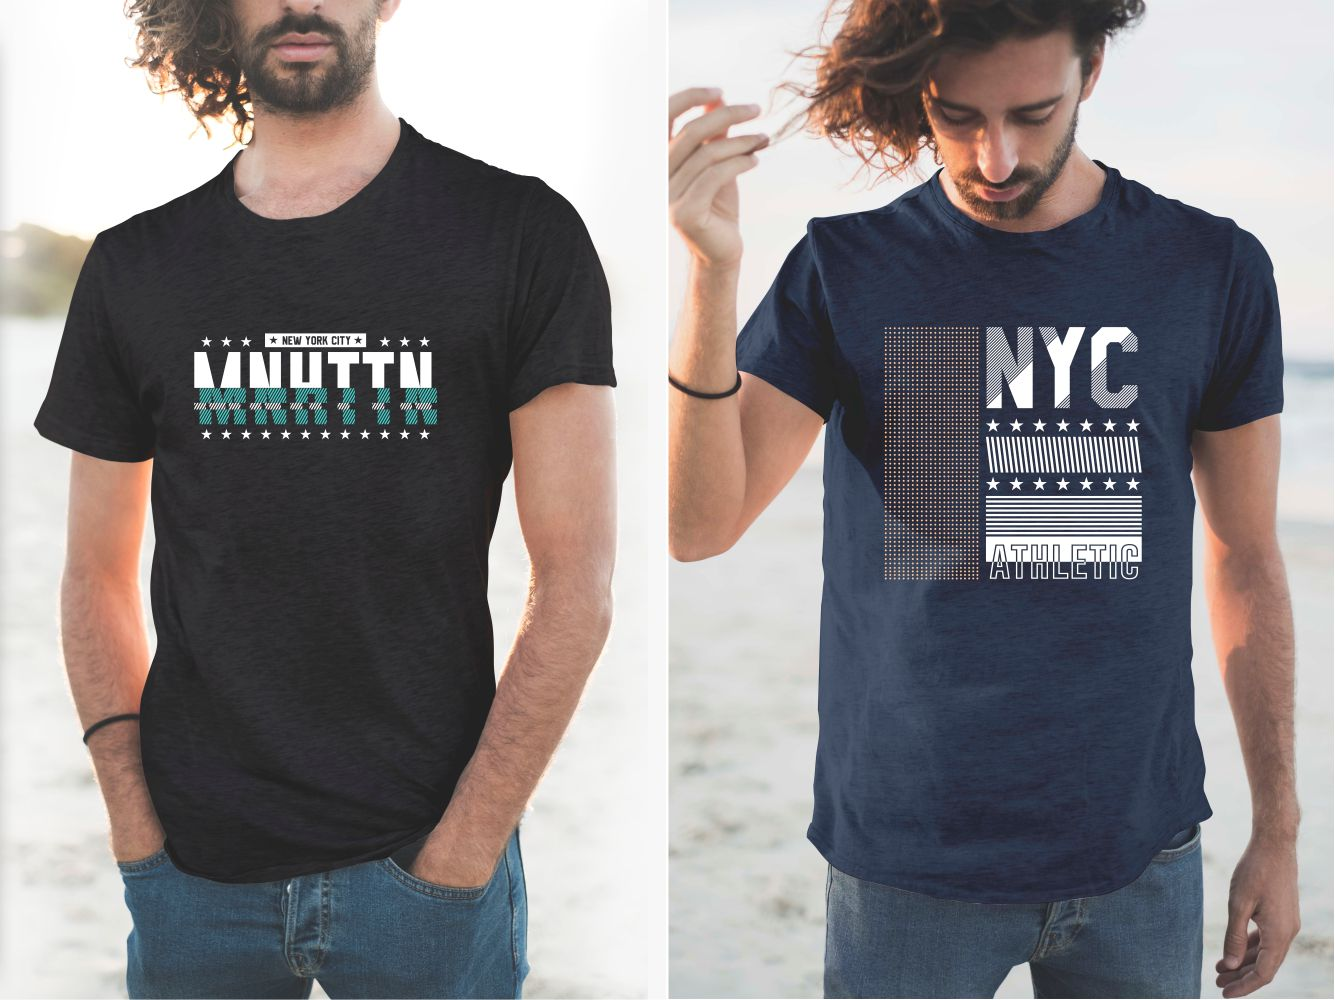 106 Urban T-shirt Designs Collection - 39 1